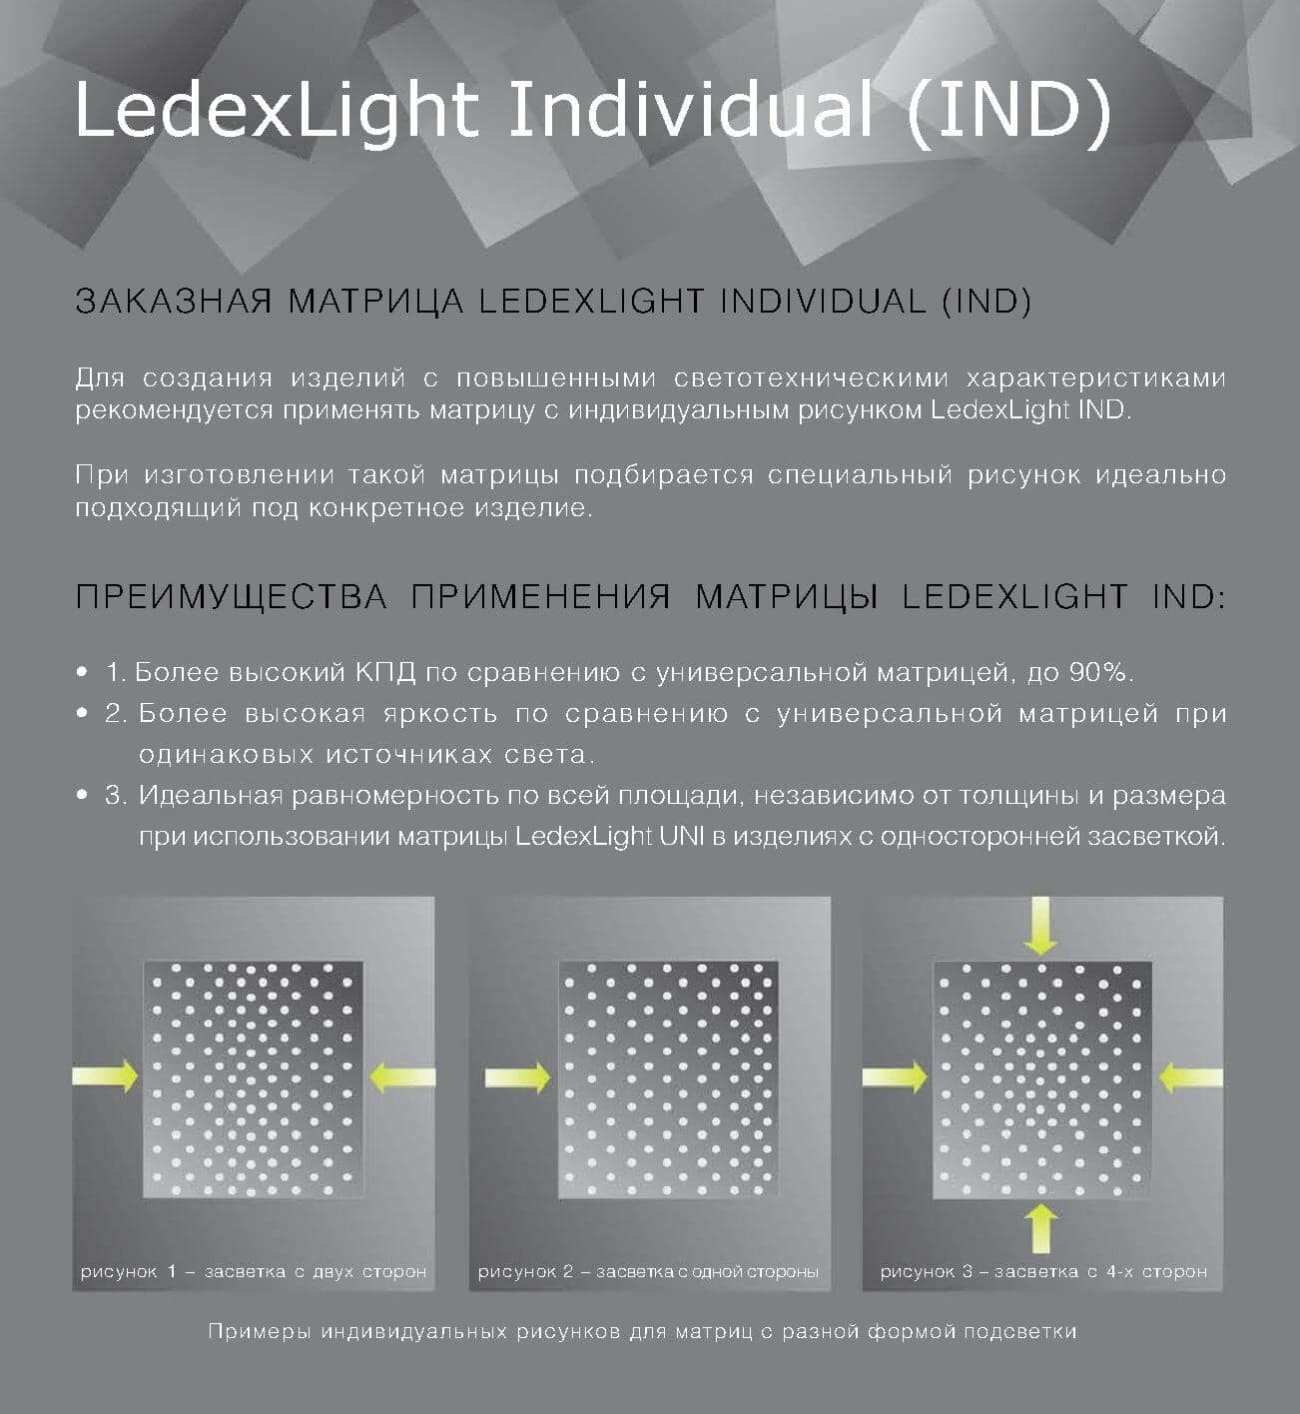 Ledexlight Individual